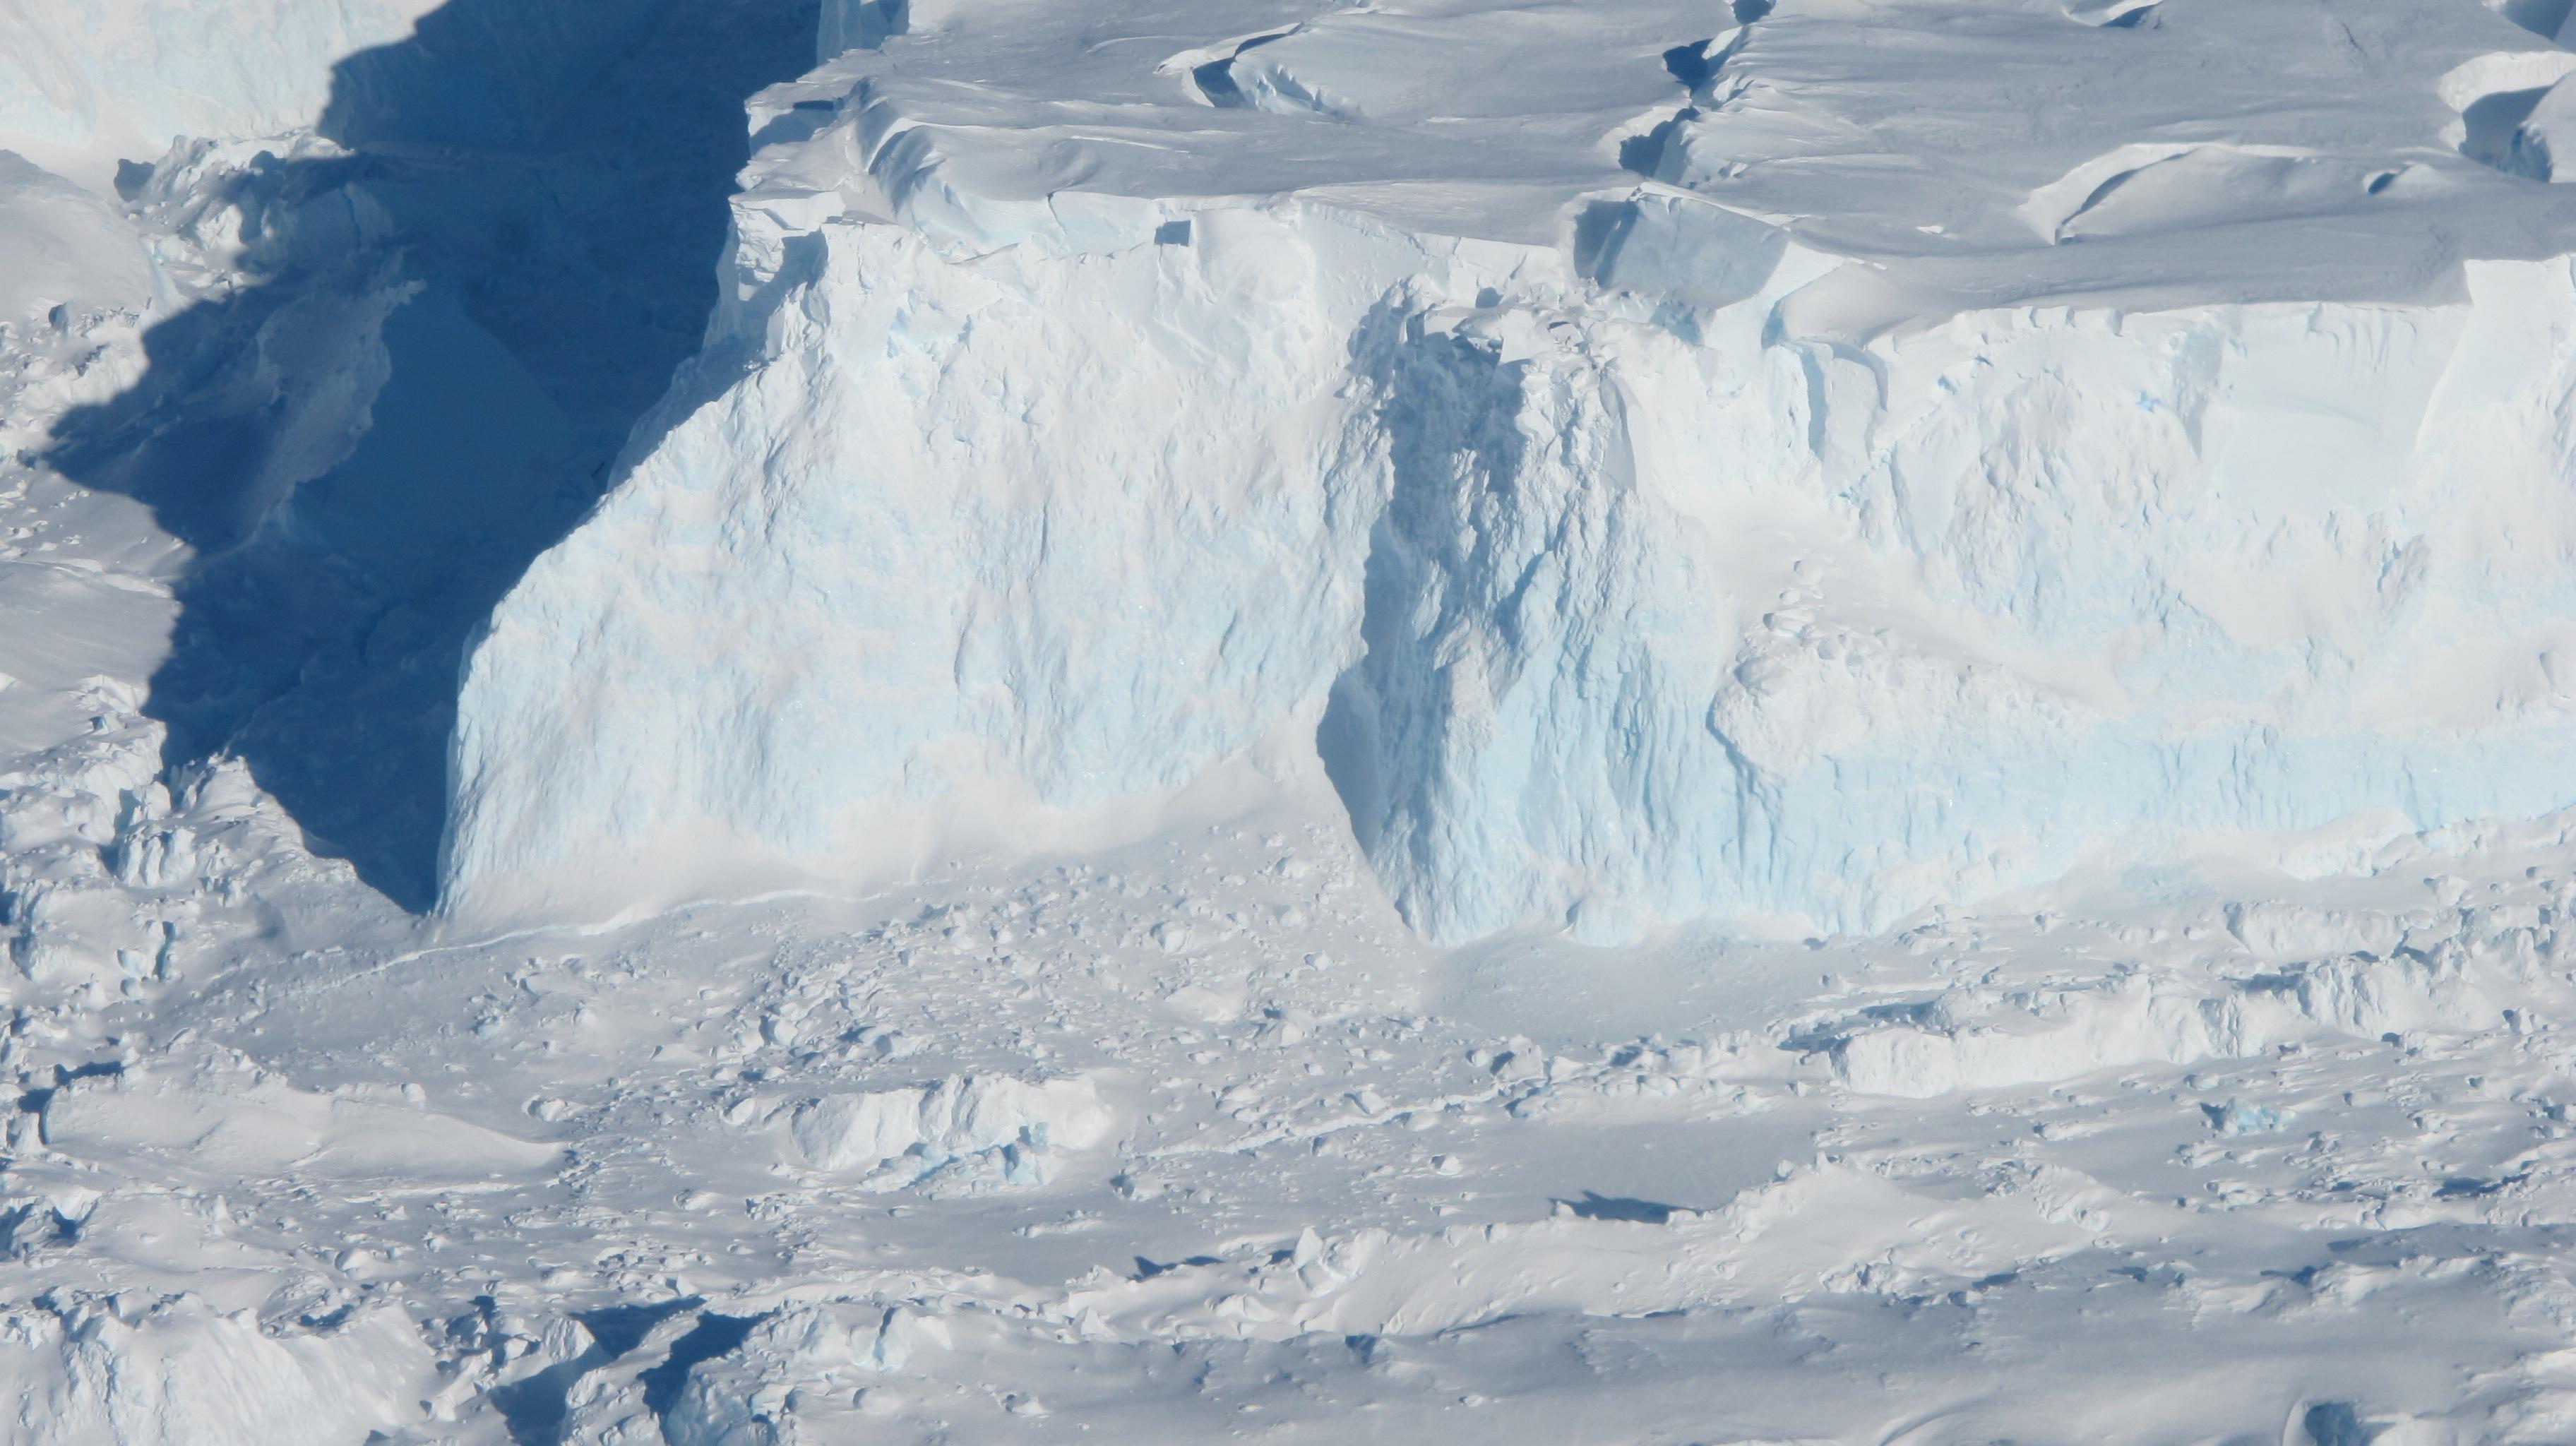 Antarktis: Riesige Seen unter Gletscher entdeckt